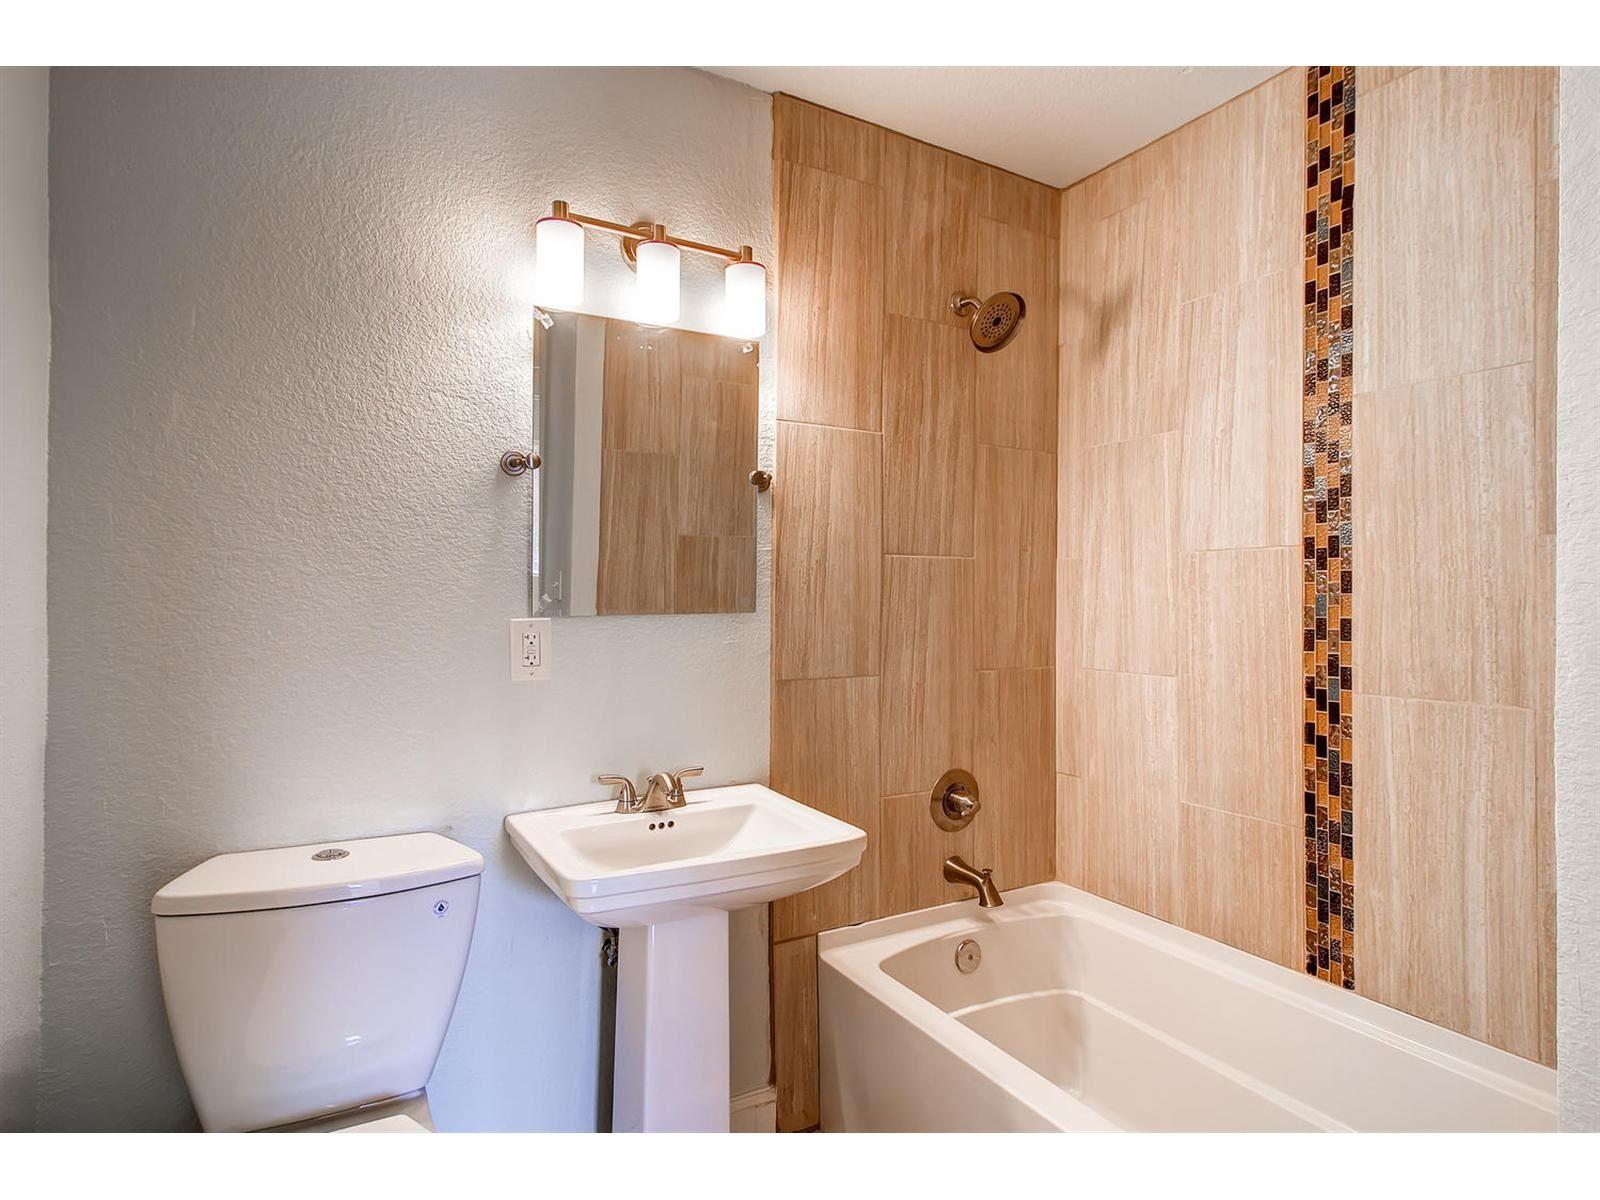 skinny bathtub   bathroom remodel ideas   Pinterest   Bathtubs ...